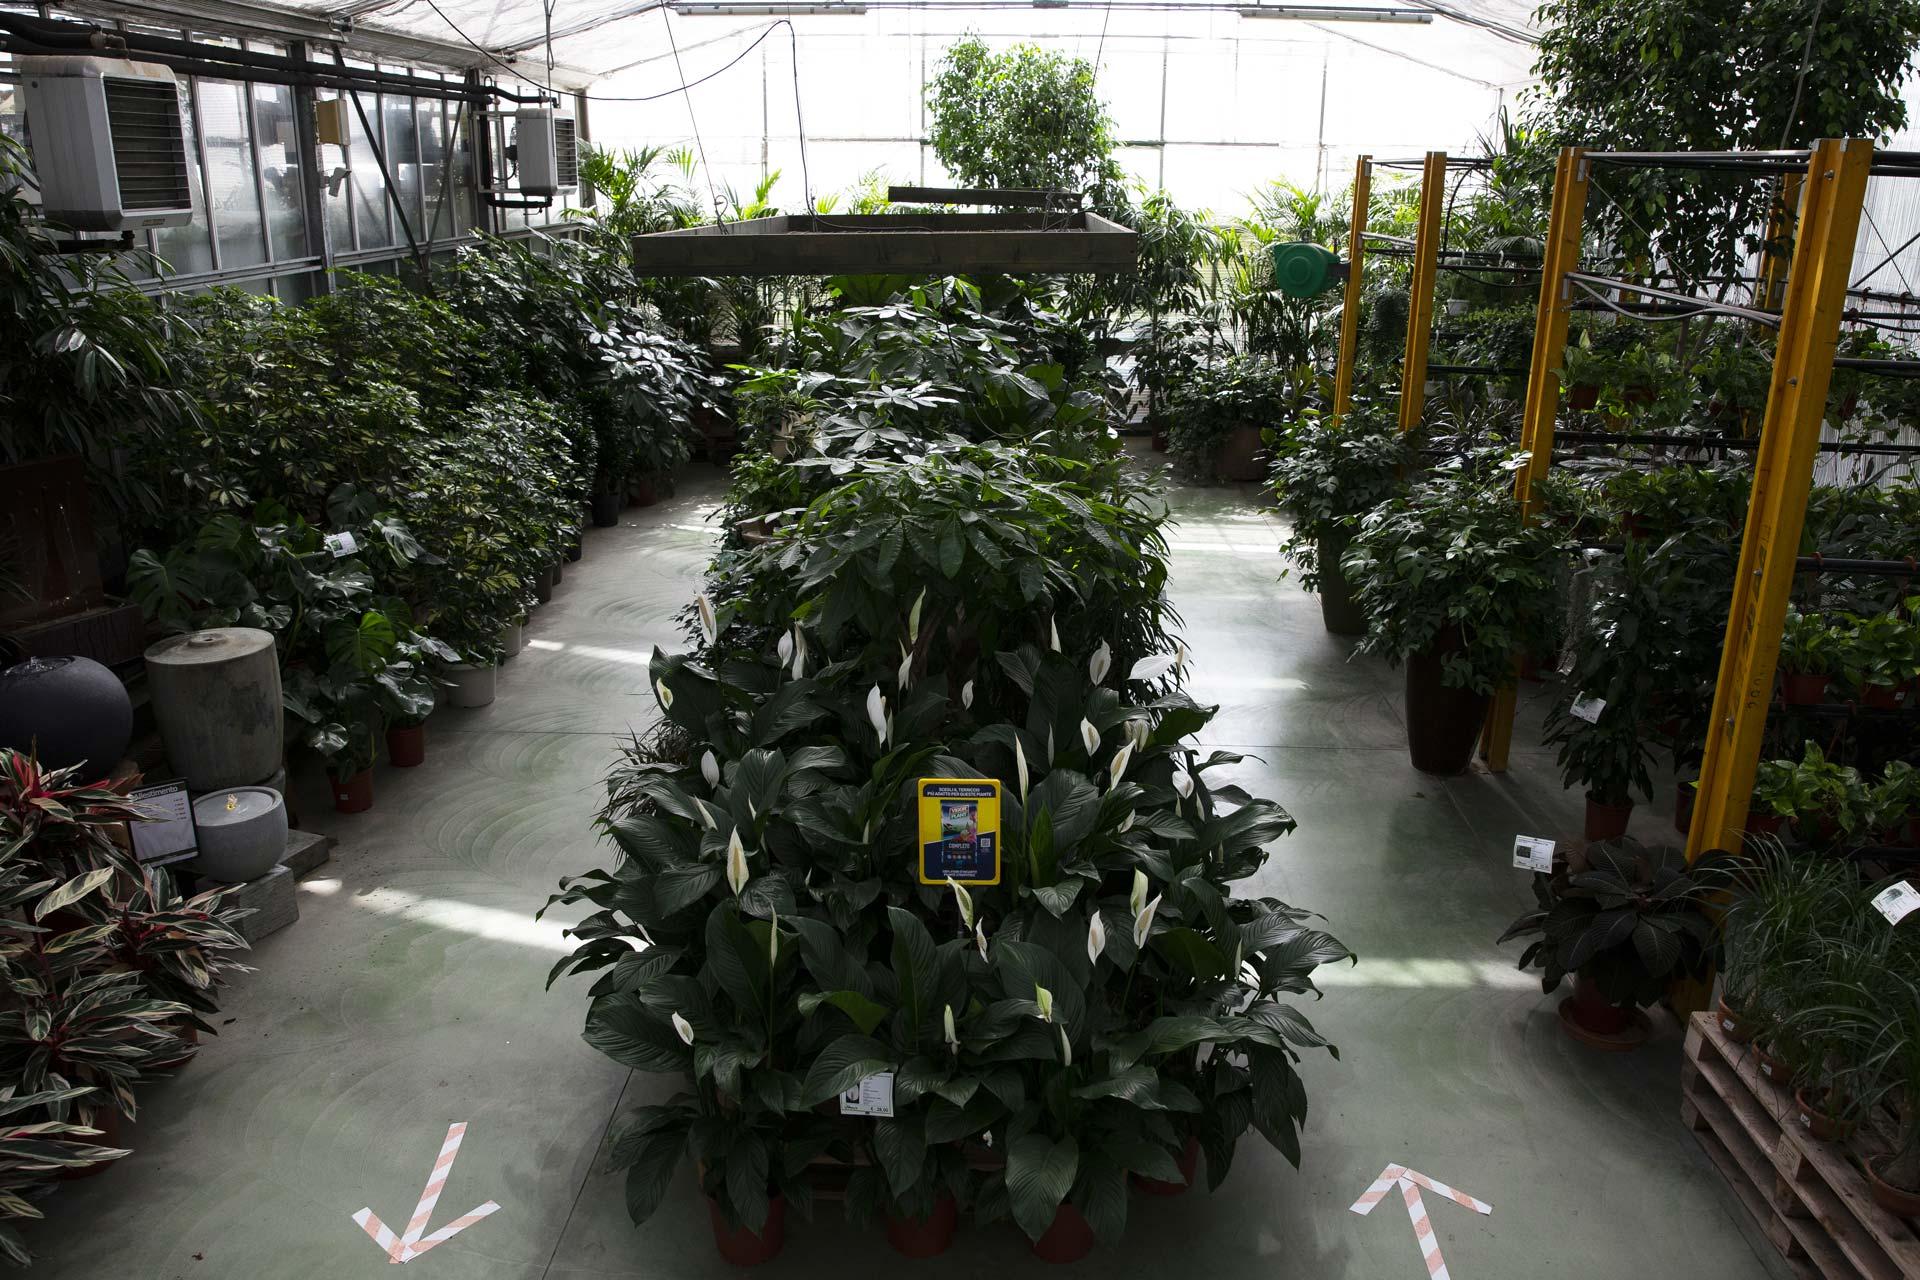 https://www.salmasogarden.it/wp-content/uploads/2020/11/reparti-salmaso-garden-piante.jpg